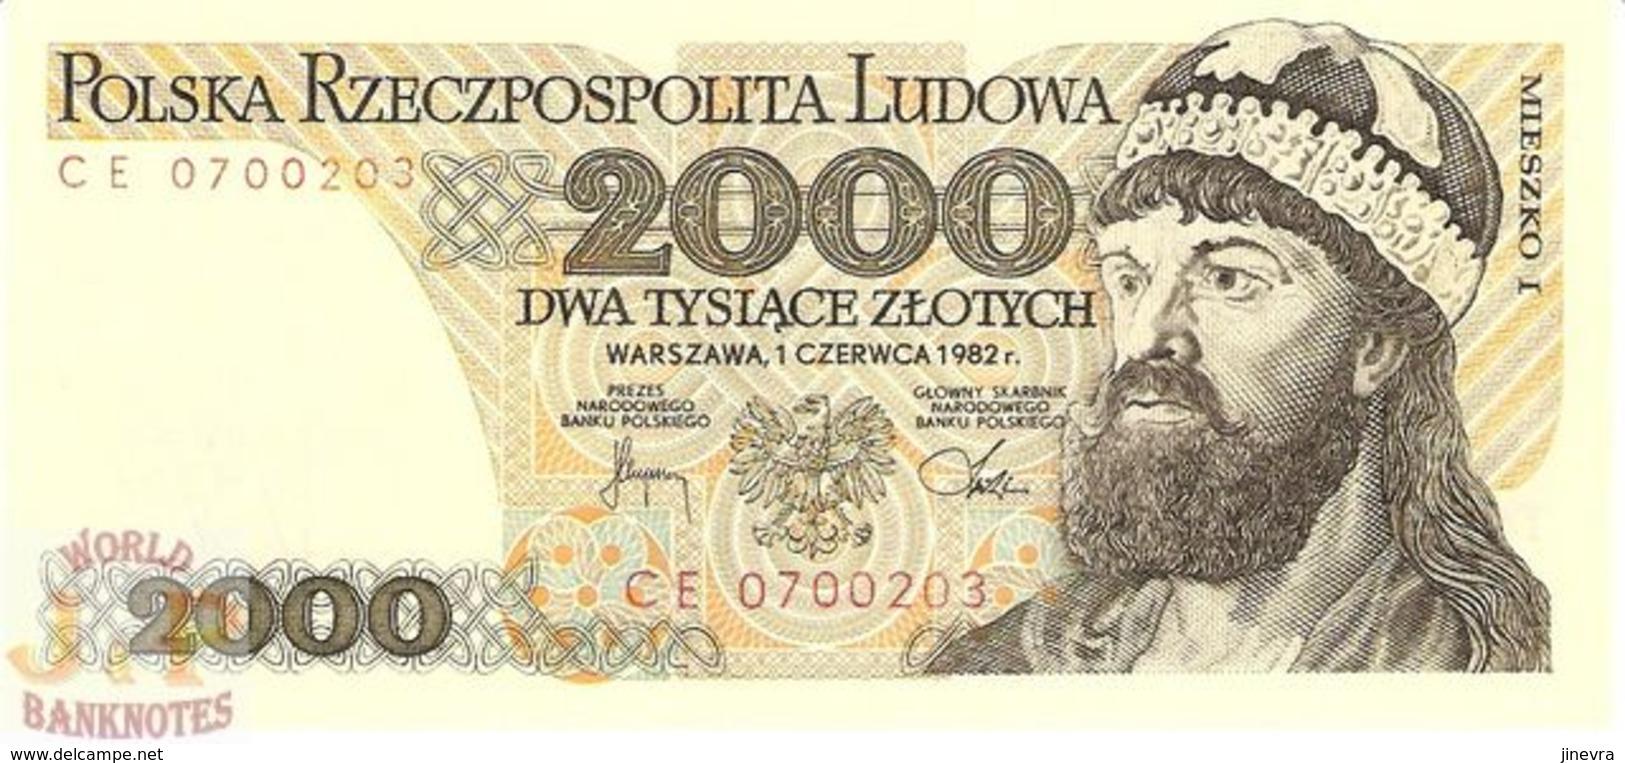 POLAND 2000 ZLOTYCH 1982 PICK 147c UNC - Polonia